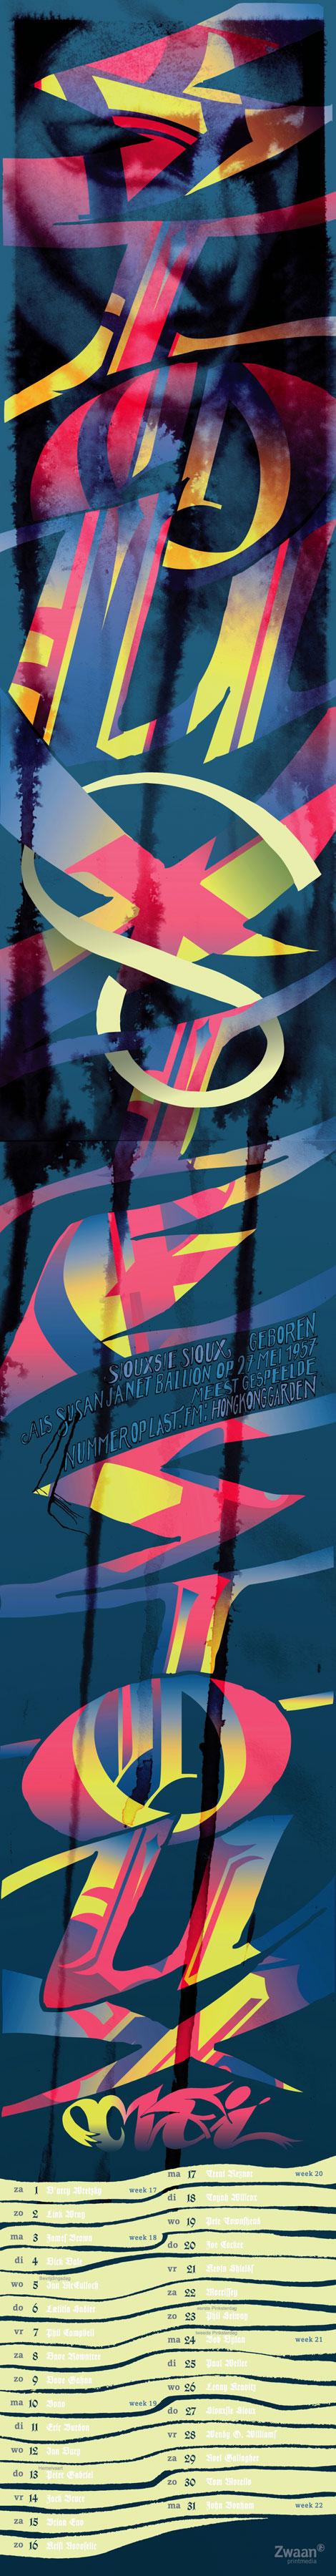 Siouxsie, Sioux, kalender, typography, calendar, Zwaan, Enkeling, 2010